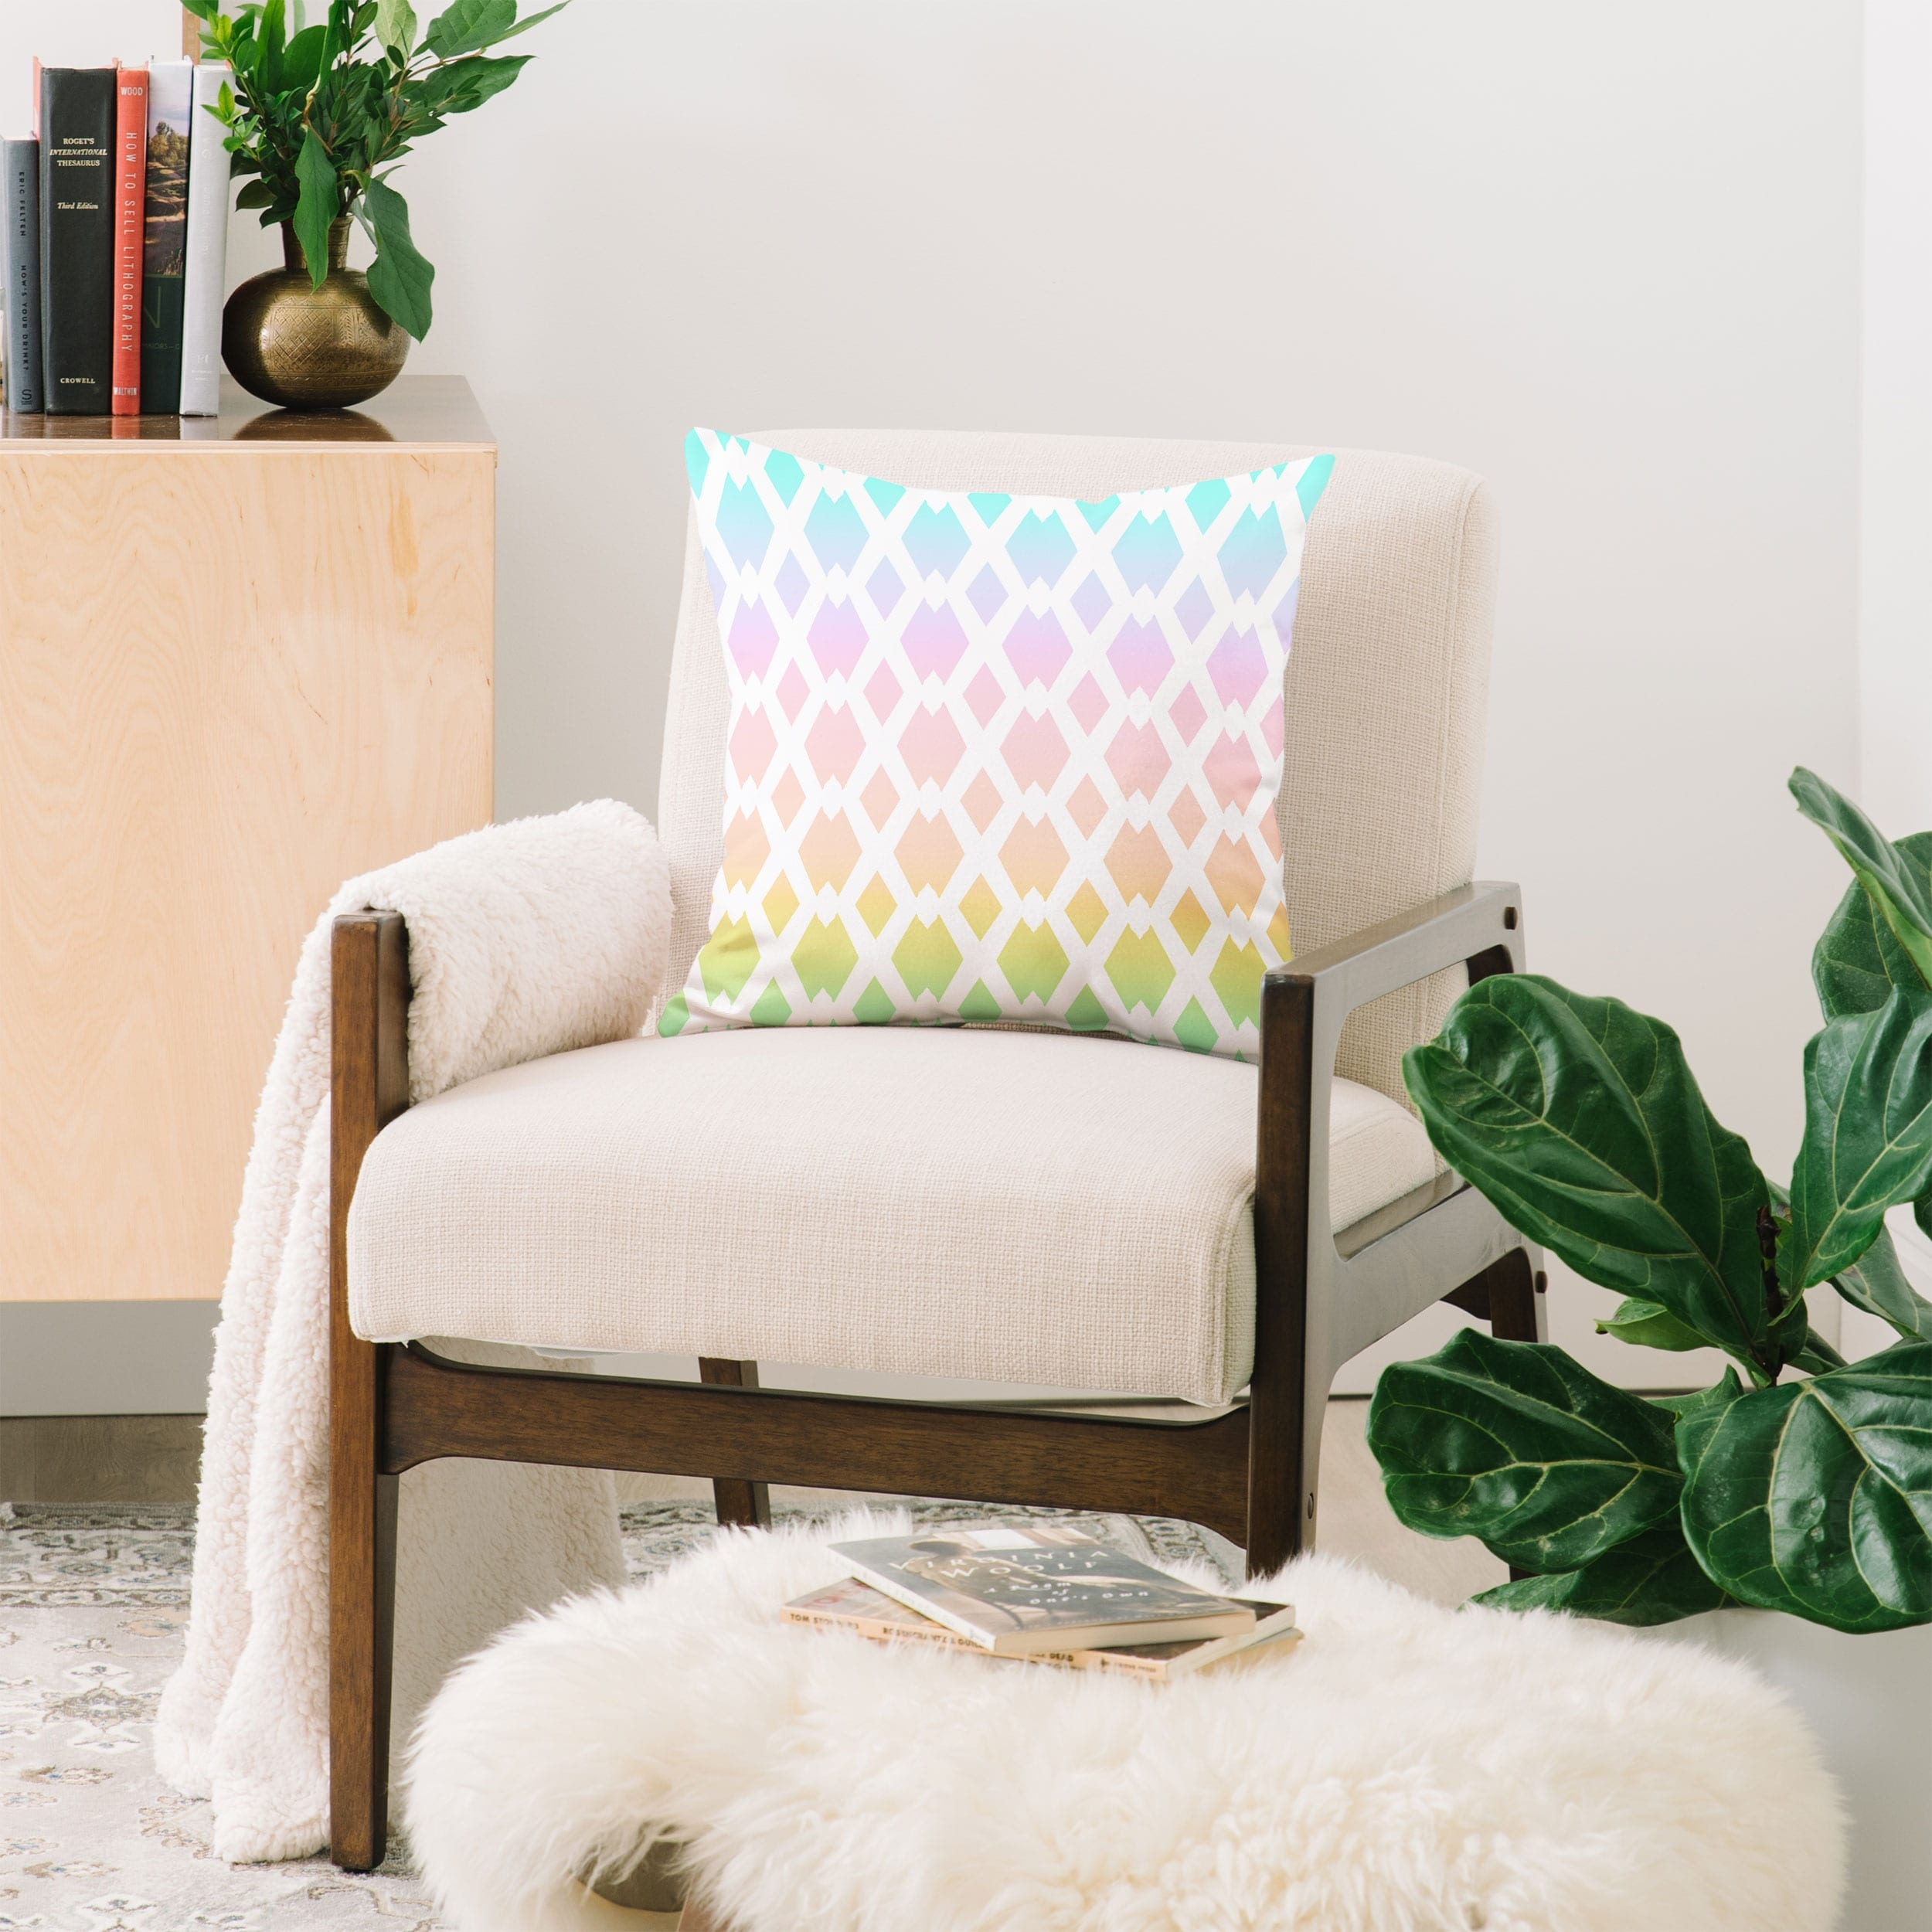 Deny Designs Lattice Pastel Rainbow Reversible Throw Pillow 4 Size Options Overstock 29845852